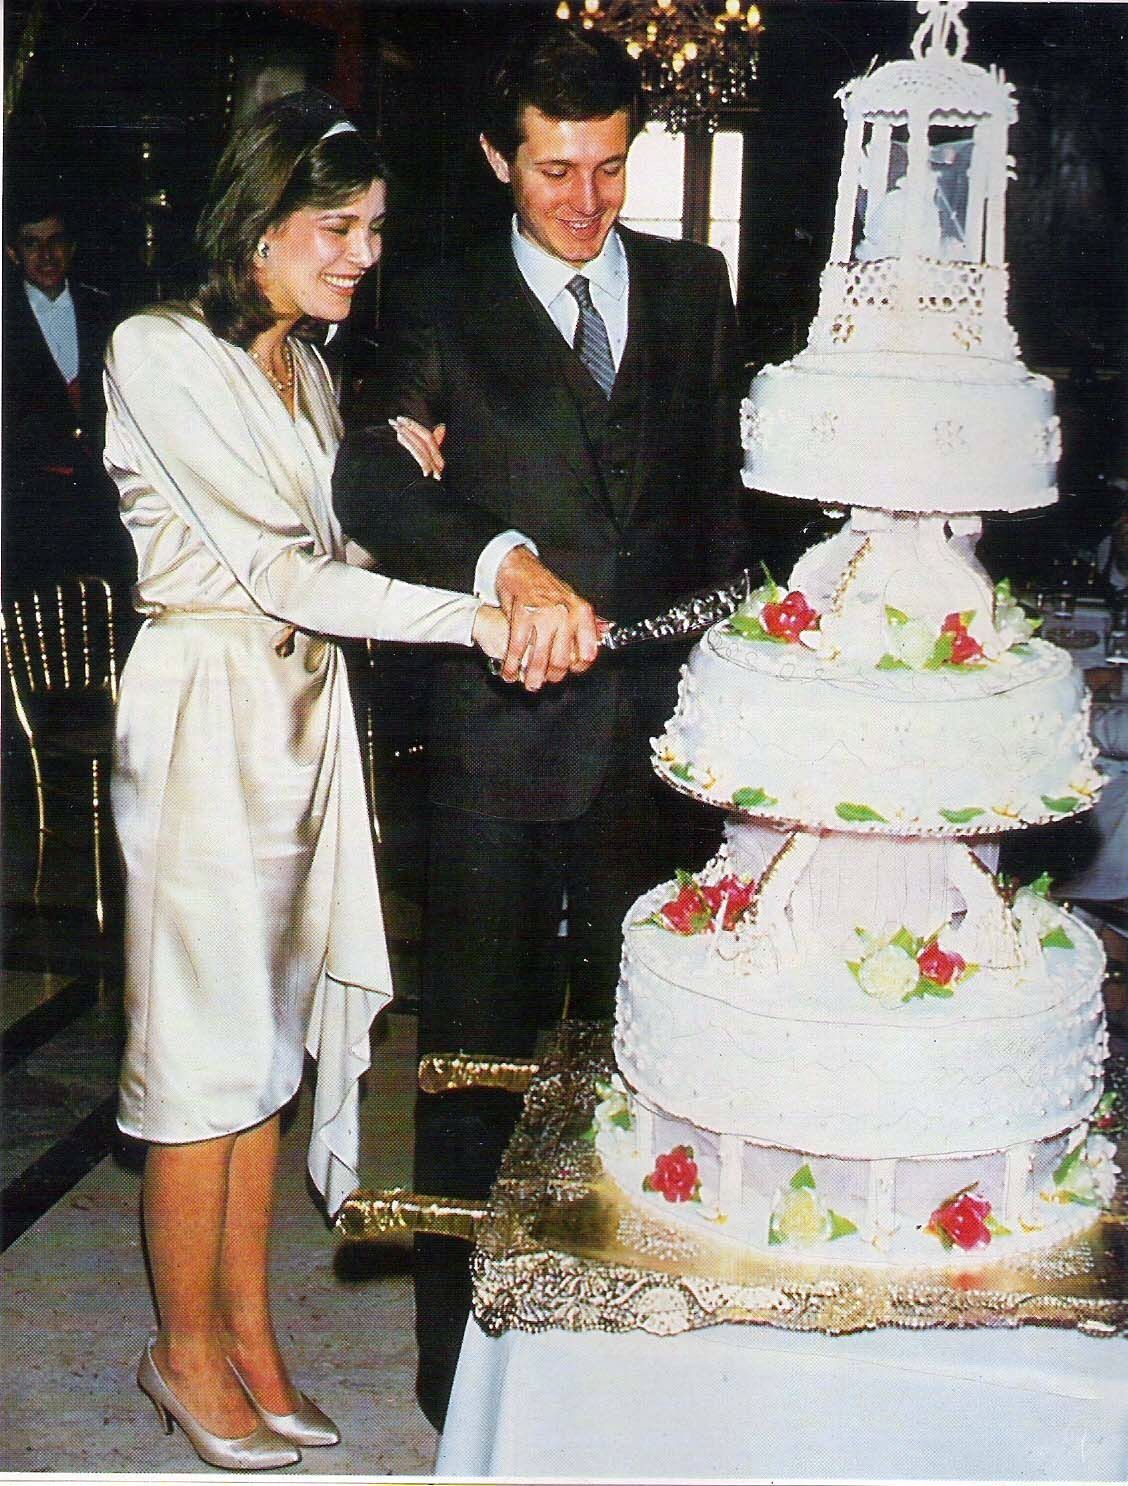 Monaco - 1983 Caroline & Stefano Casiraghi